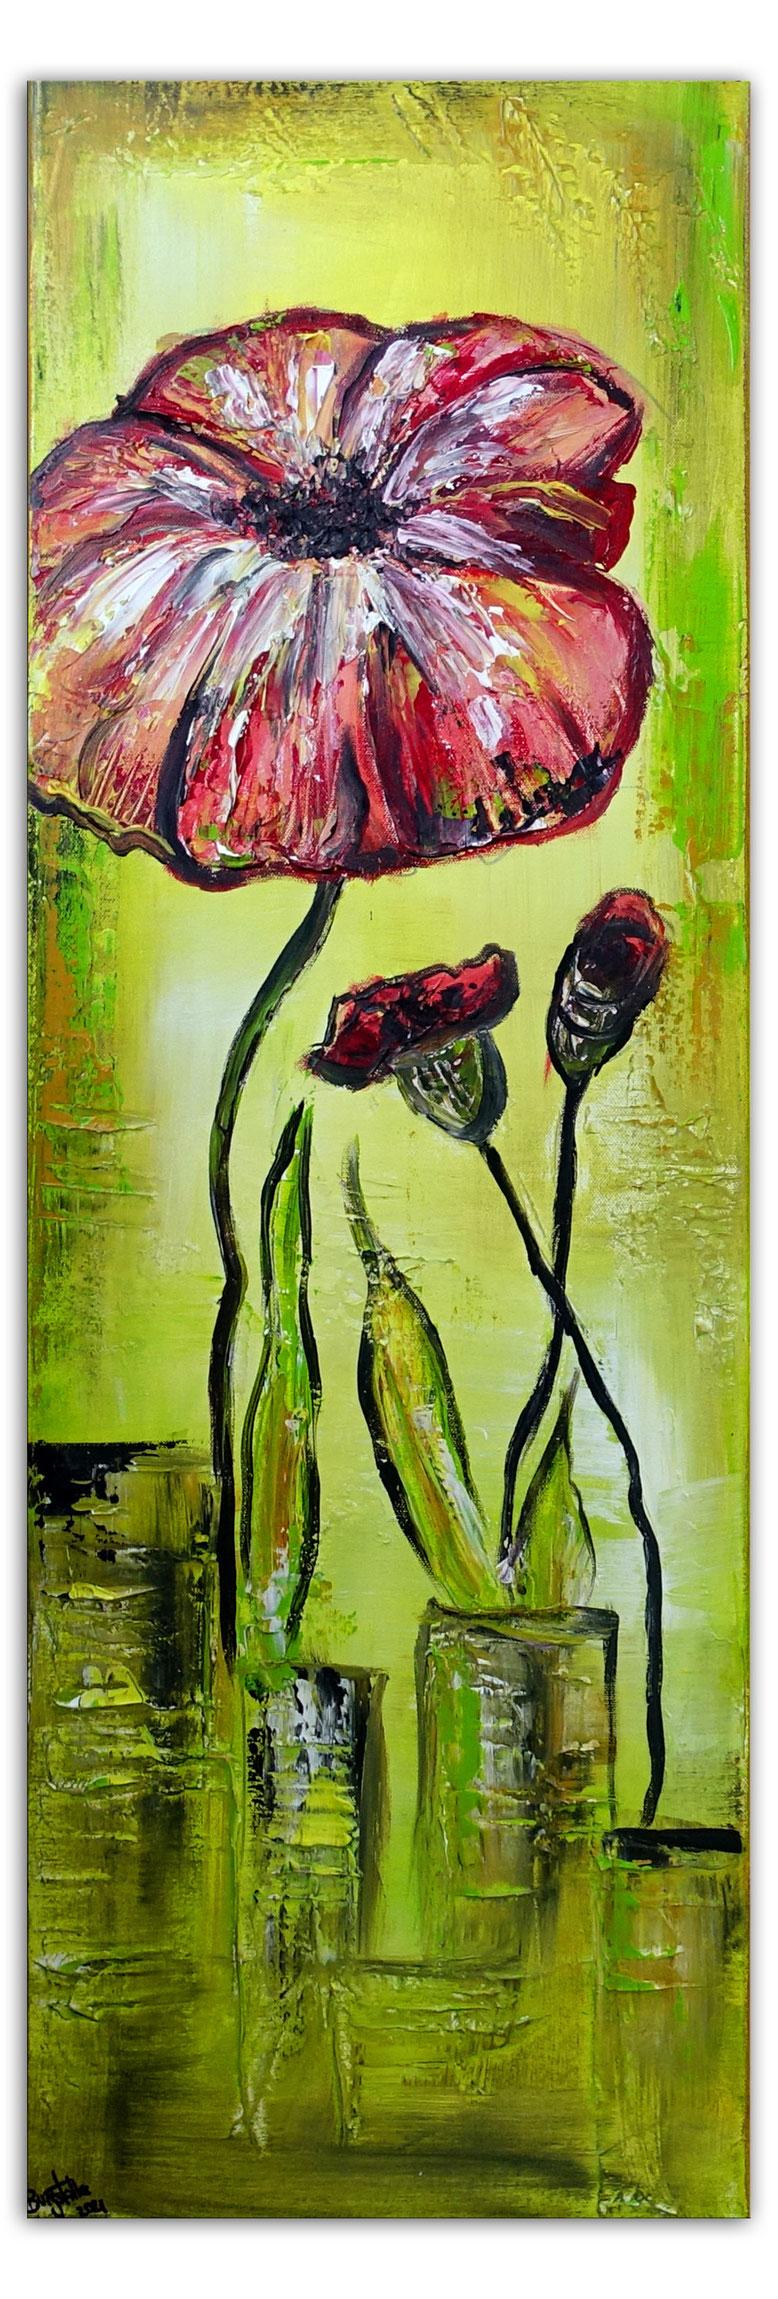 Winter Tulpen Blumenbild Wandbild Blumen Malerei Original Acryl Gemälde